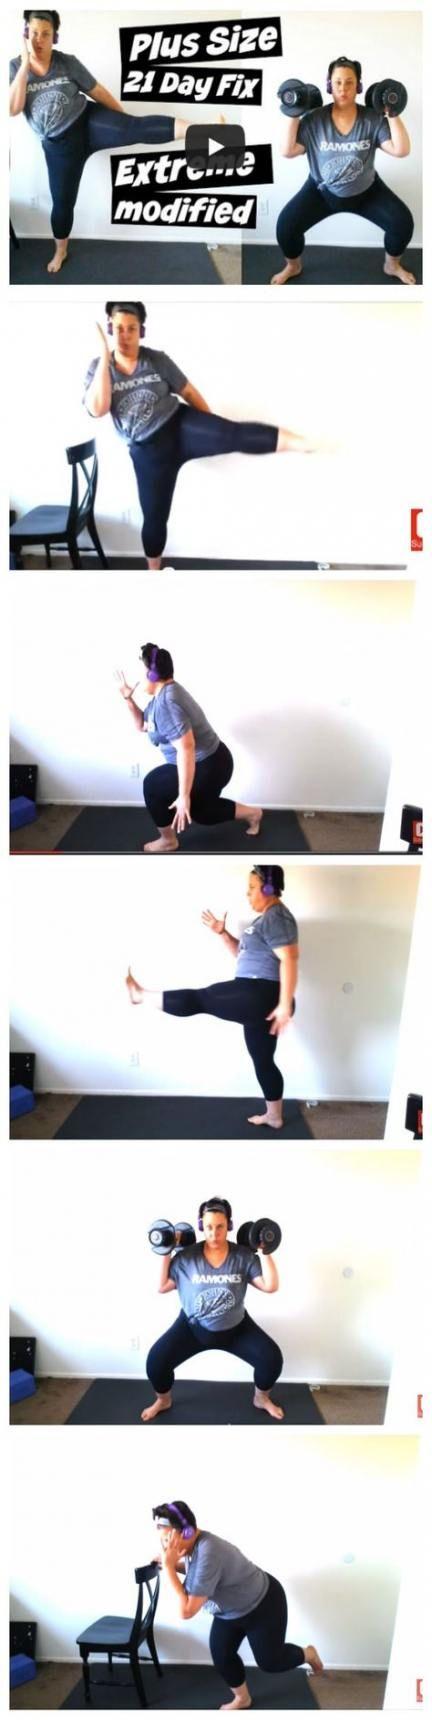 48 Trendy Fitness Motivacin Plus Size Exercise #fitness